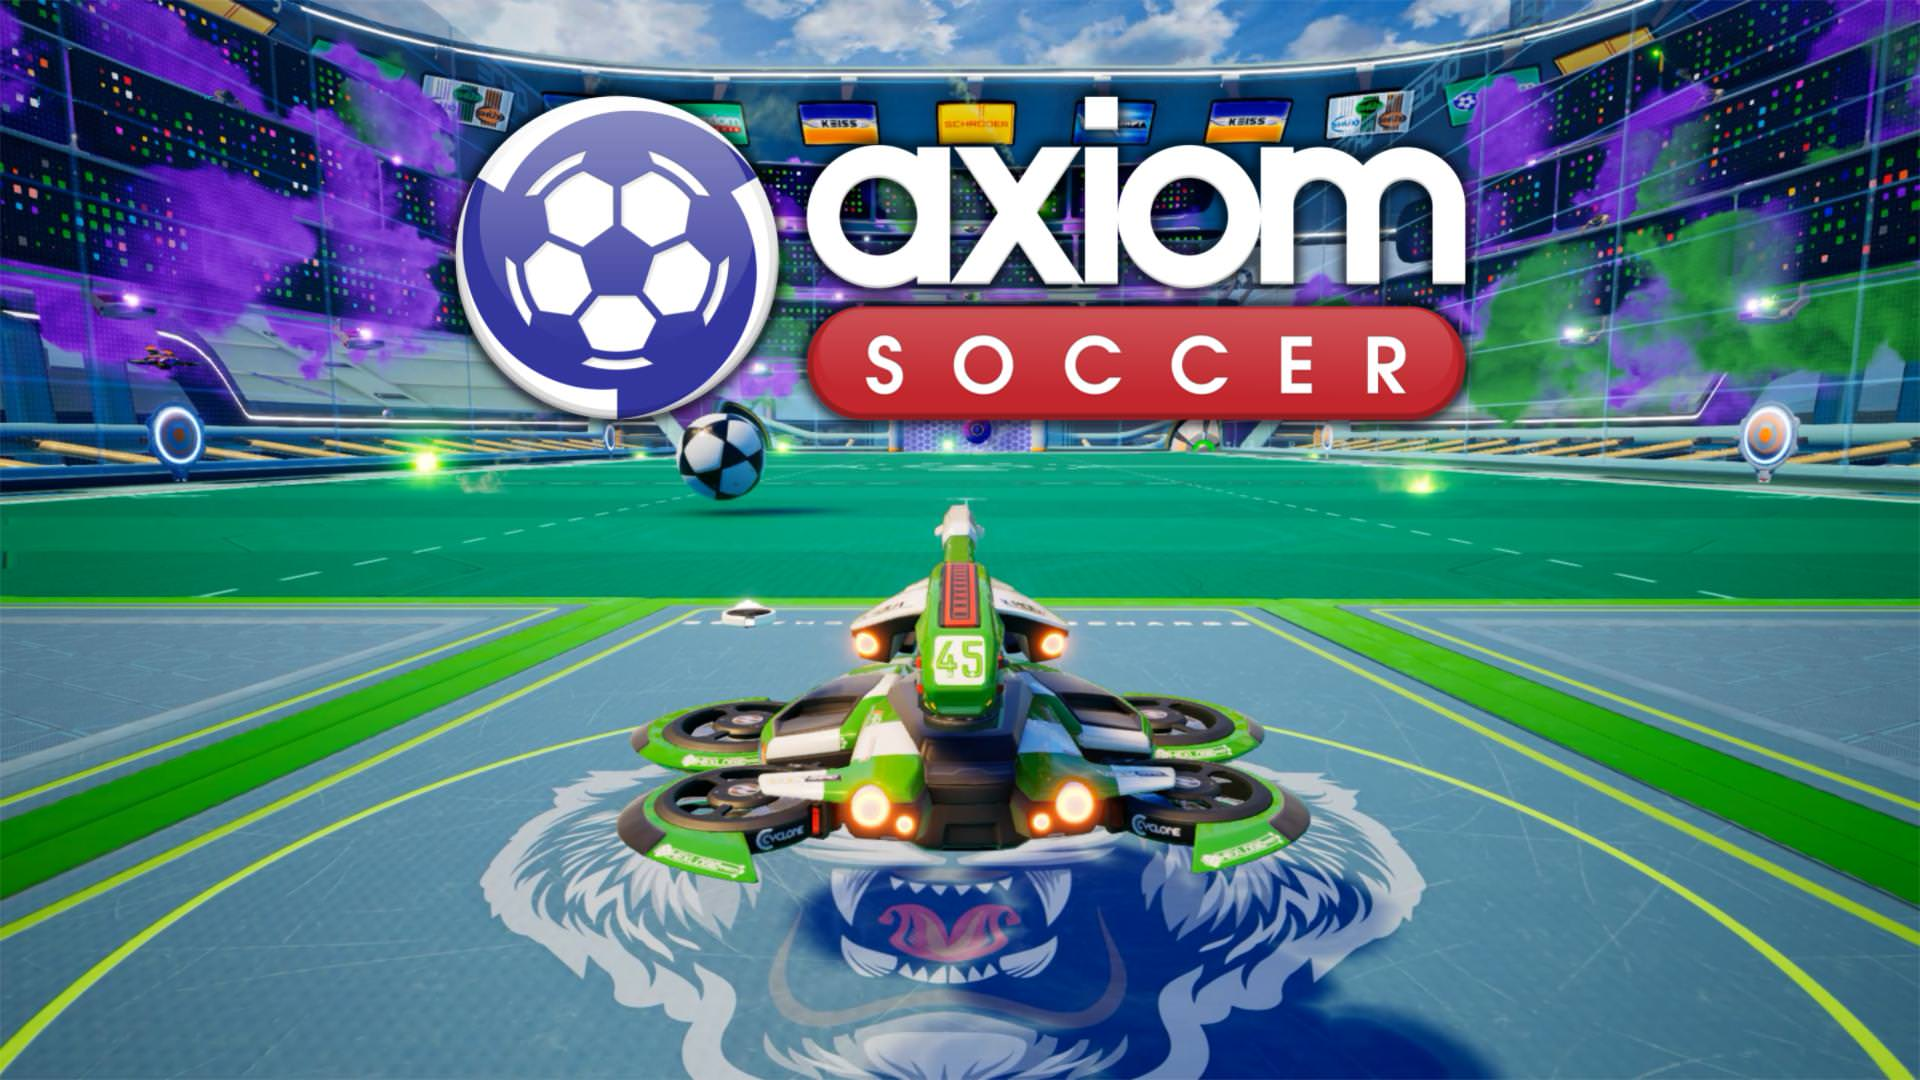 conoce-a-axiom-soccer-un-rocket-league-gratuito-frikigamers.com